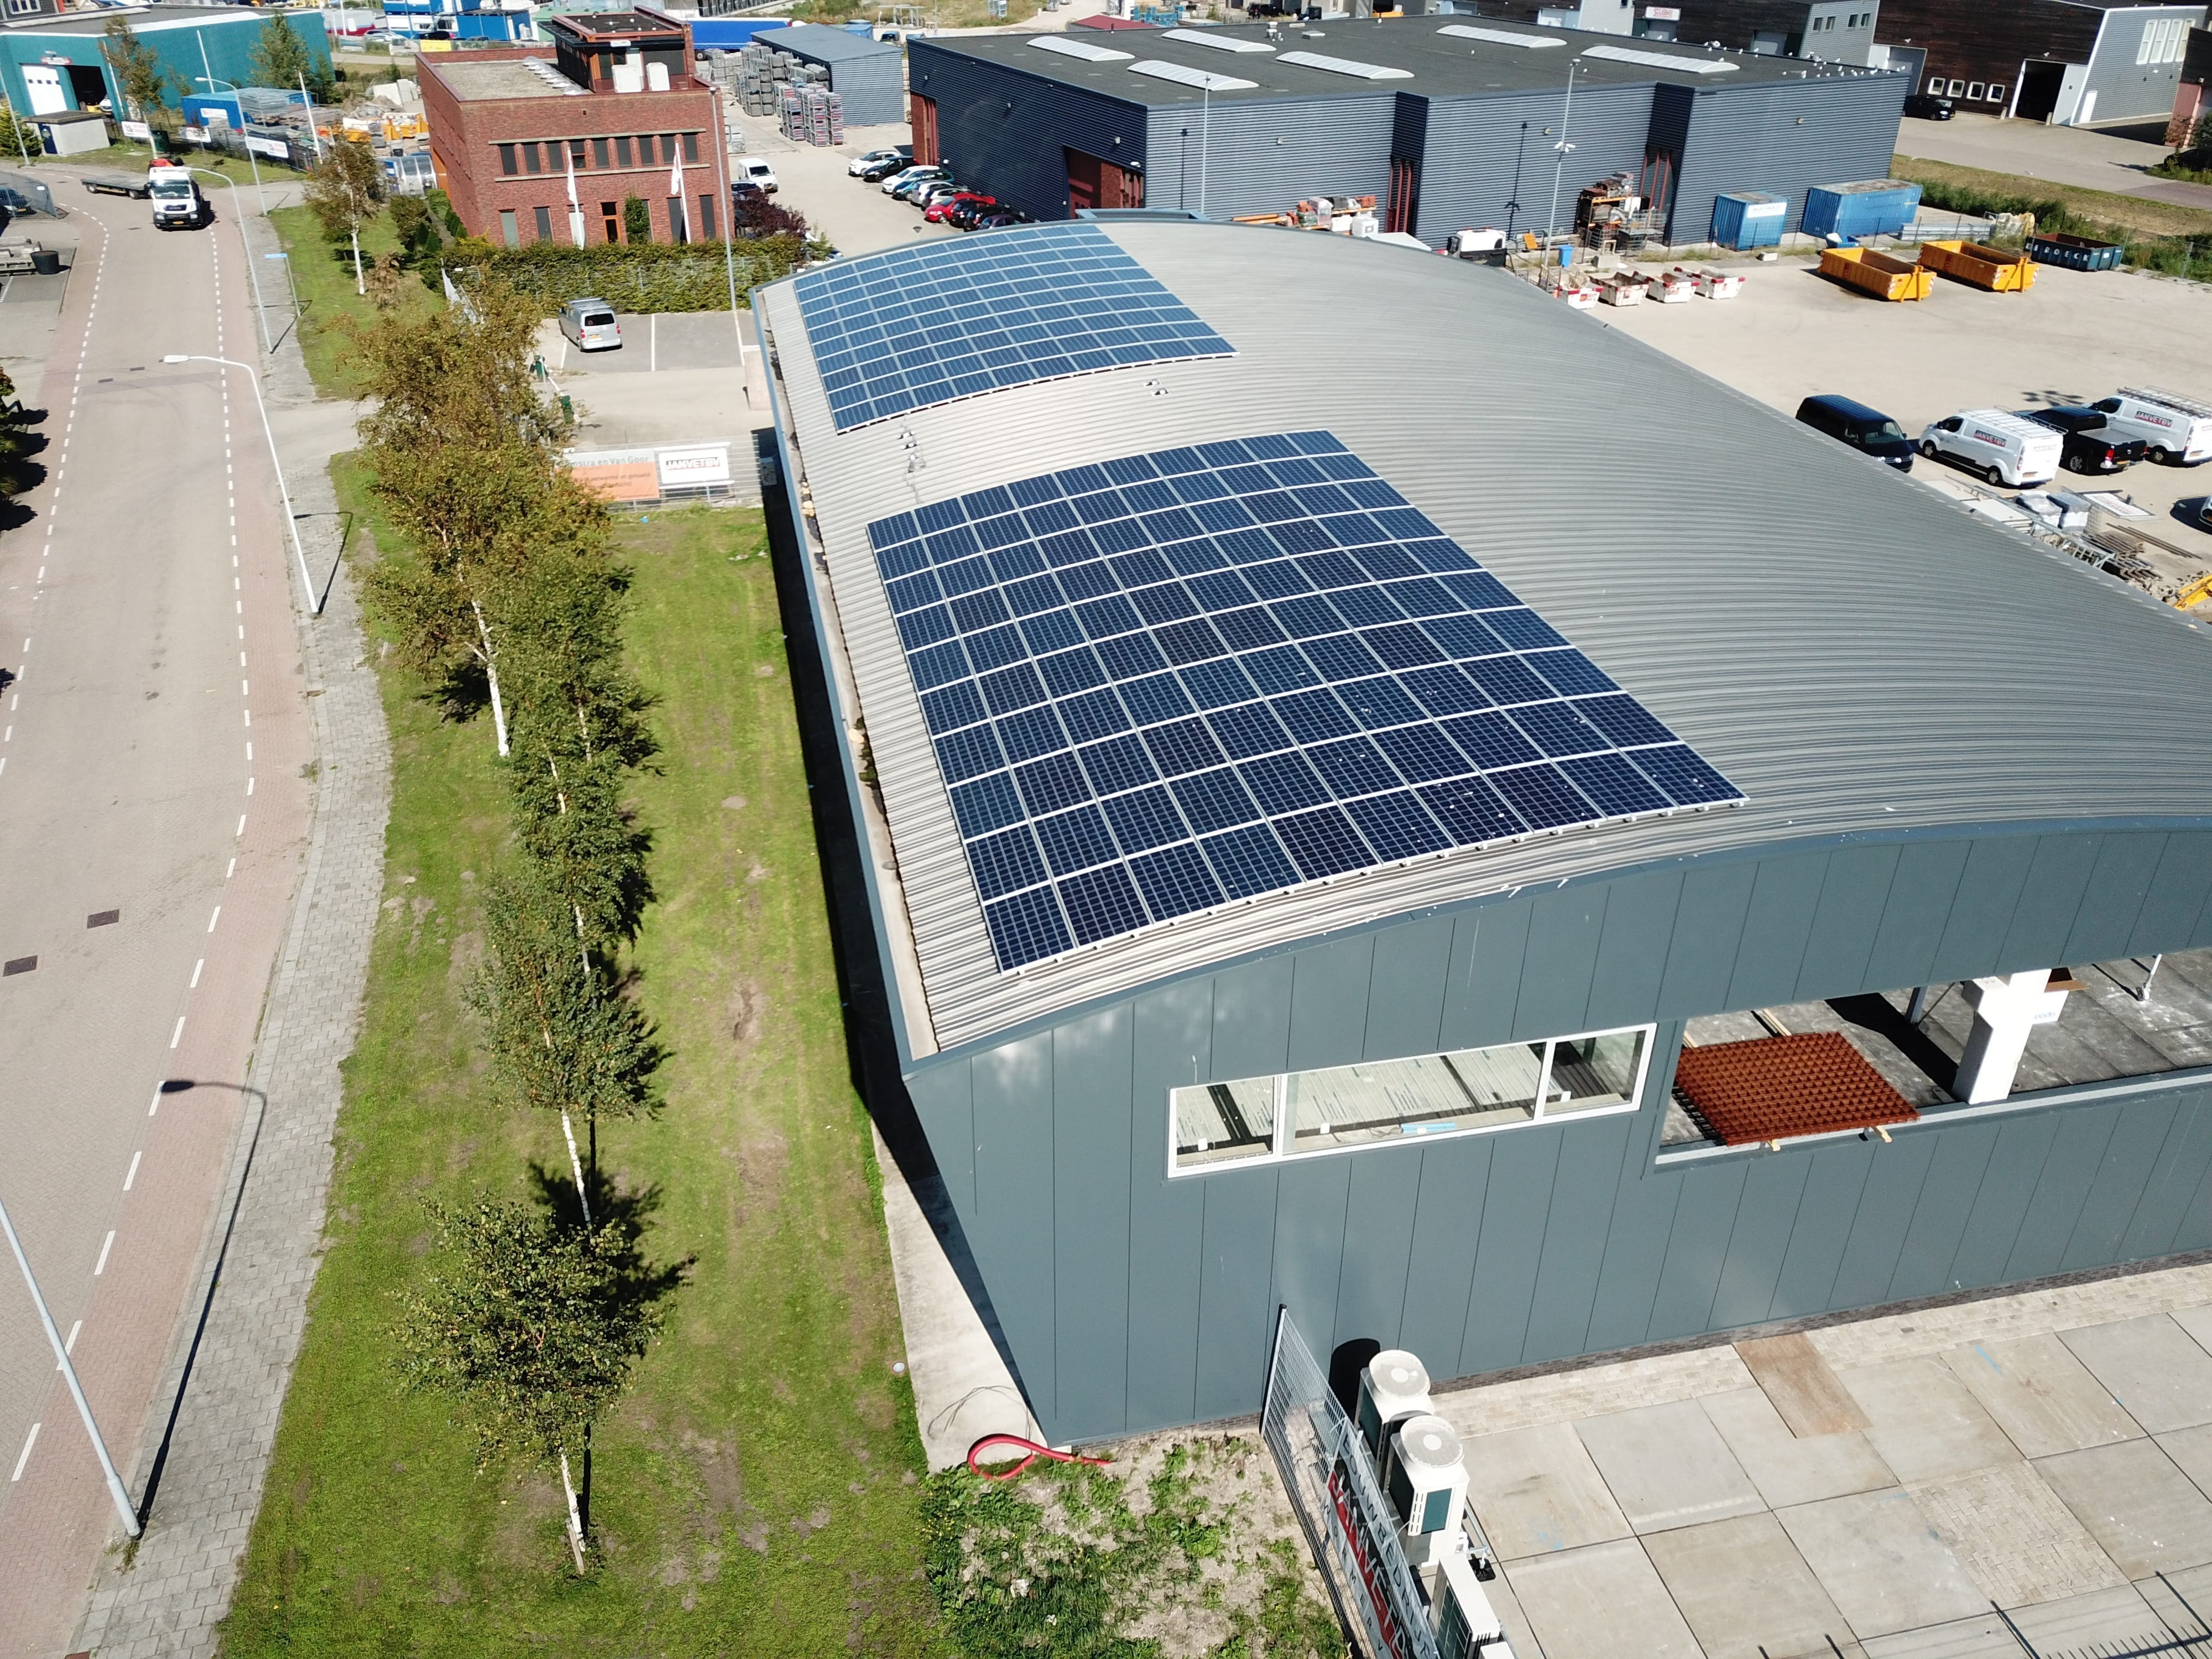 Solar Zaanstad installed APsystems microinverters at Construction Company Vet